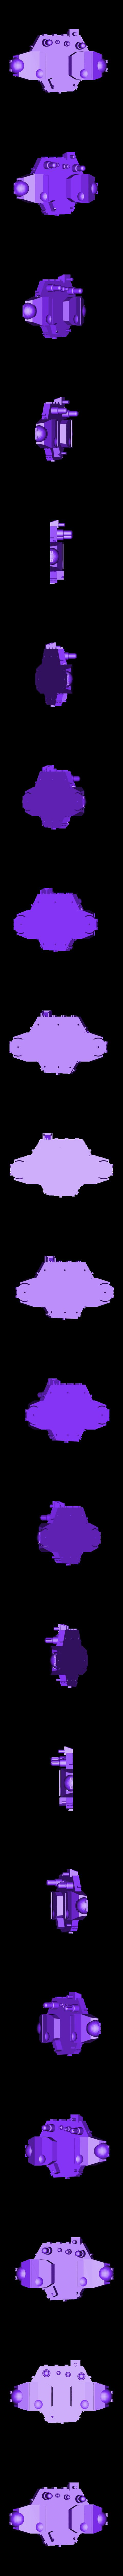 Viking 3D Top.stl Download free STL file Viking Lander - STL • 3D printable object, spac3D